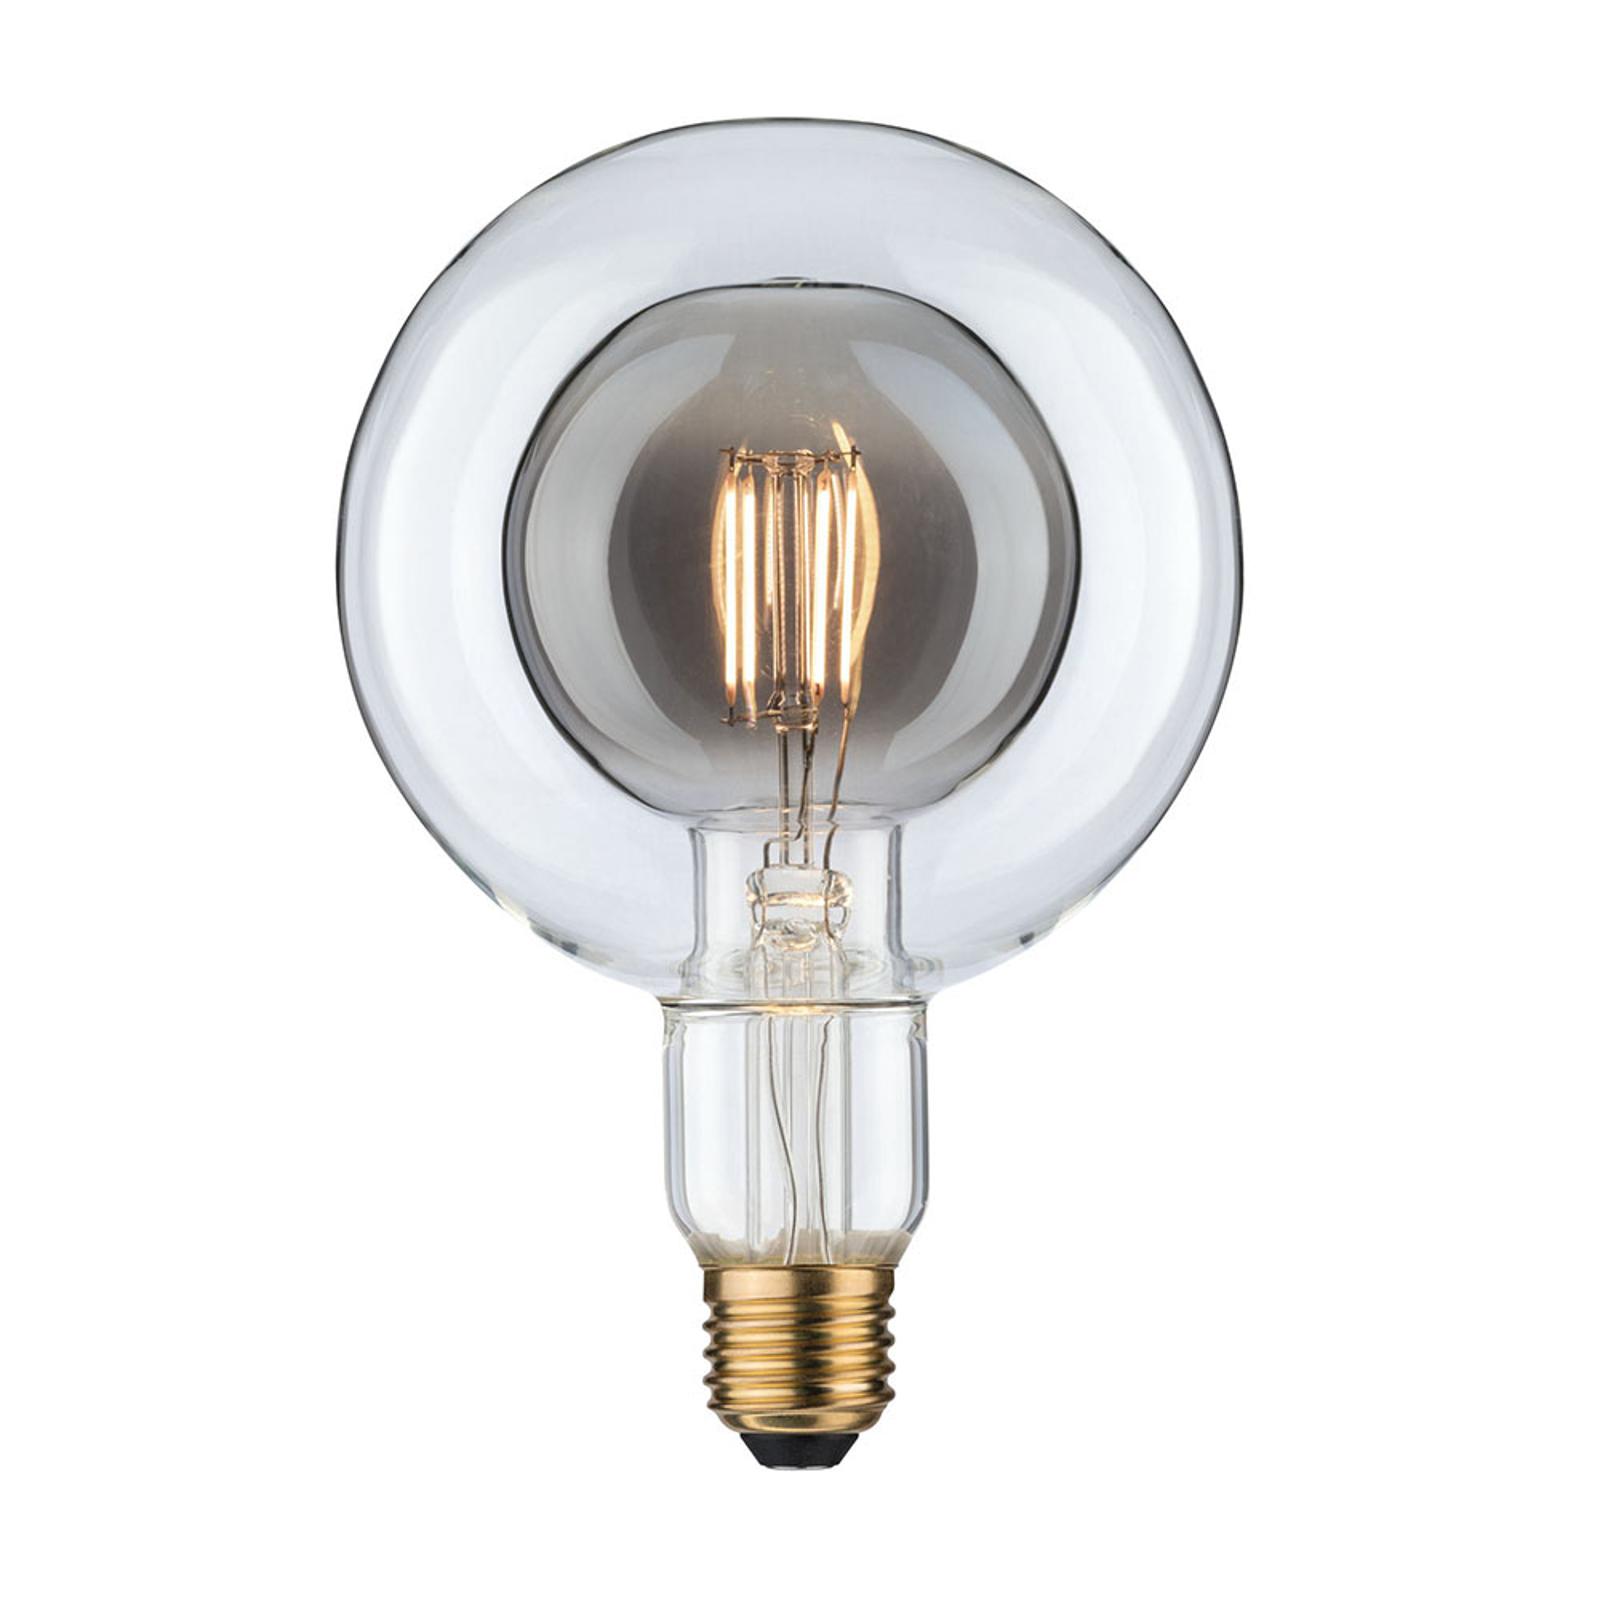 Paulmann ampoule LED E27 G125 Inner Shape 4W smoke